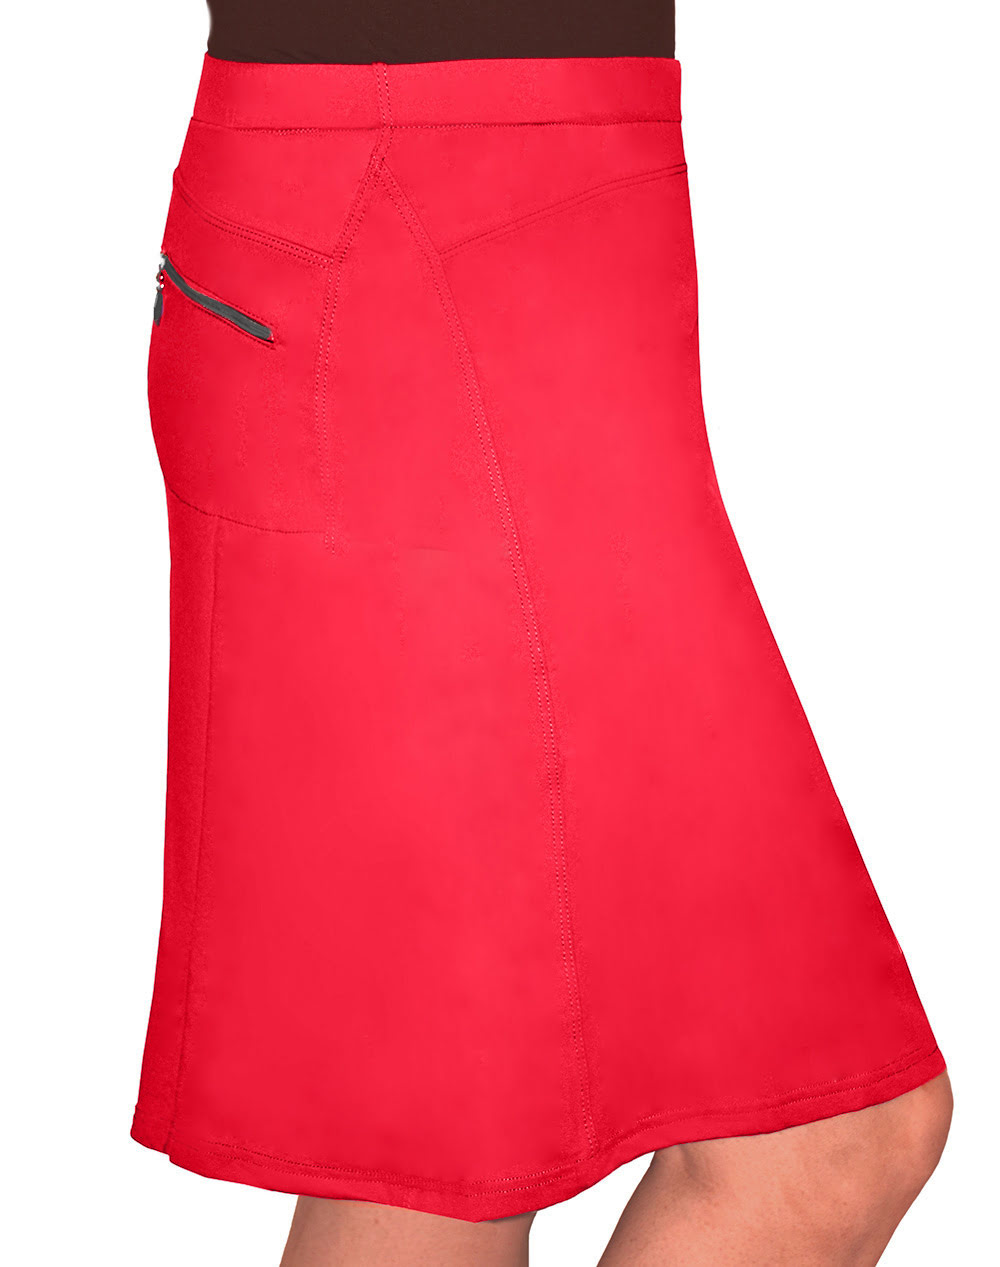 a05b2743beb Buy Modest Running Skirts. Kosher Casual